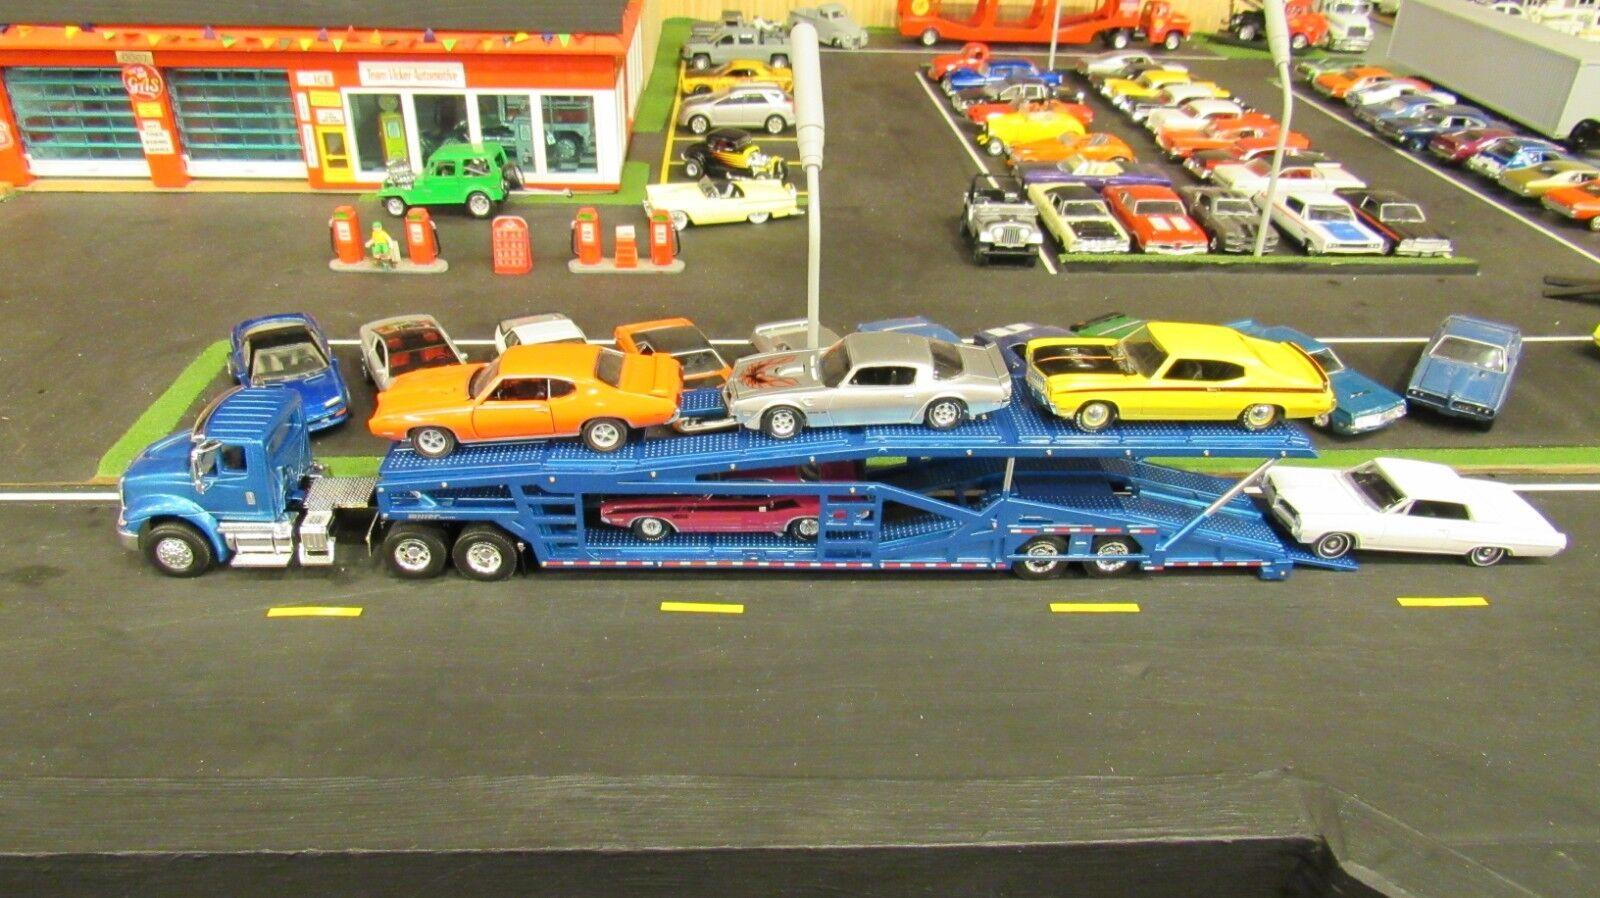 SPECCAST blueE IH 8600 SEMI CAR CAR CAR TRANSPORT TRANSPORTER CARRIER TRAILER 1 64  MTB a65f8d